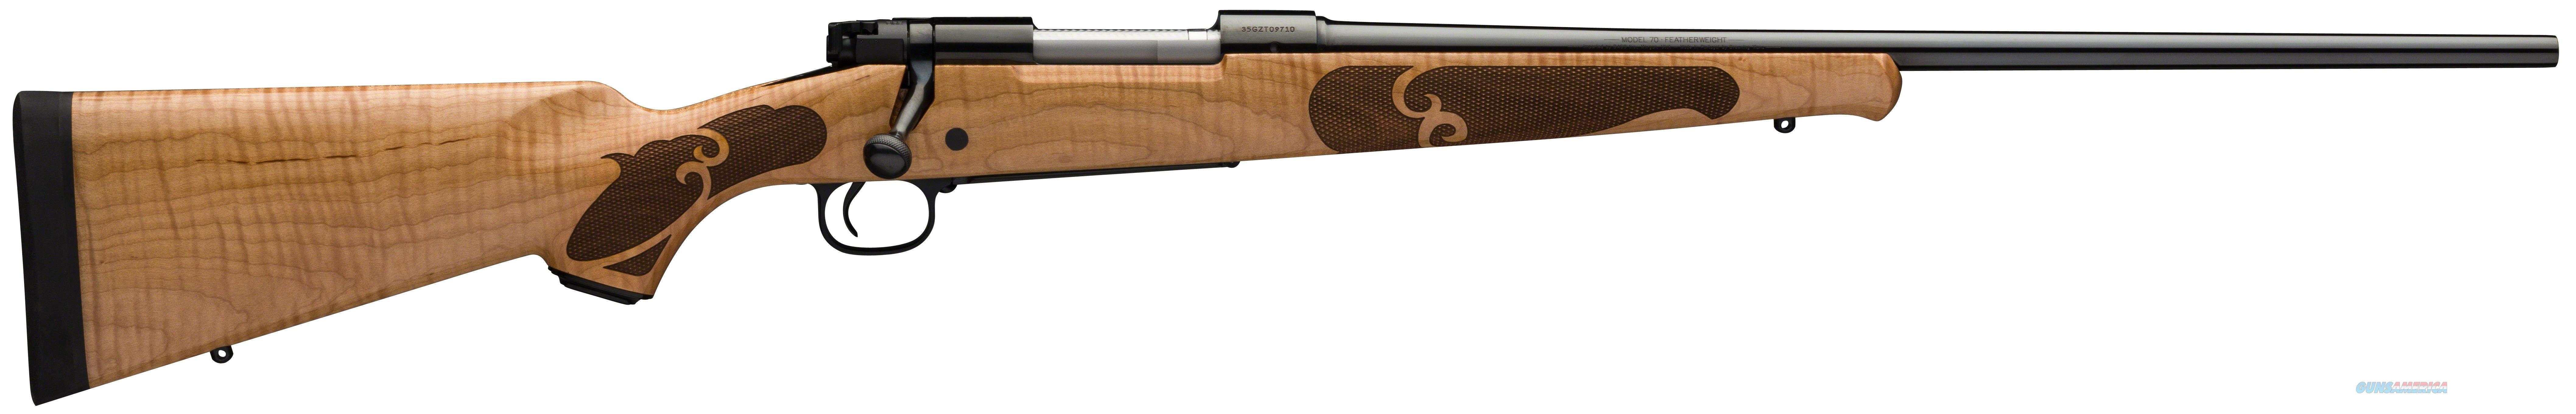 "Winchester Model 70 Featherweight High Grade Maple Stock, Blt Action, 4+1 Rnd, 22"" Bbl, 243 Win 535229212  Guns > Rifles > W Misc Rifles"